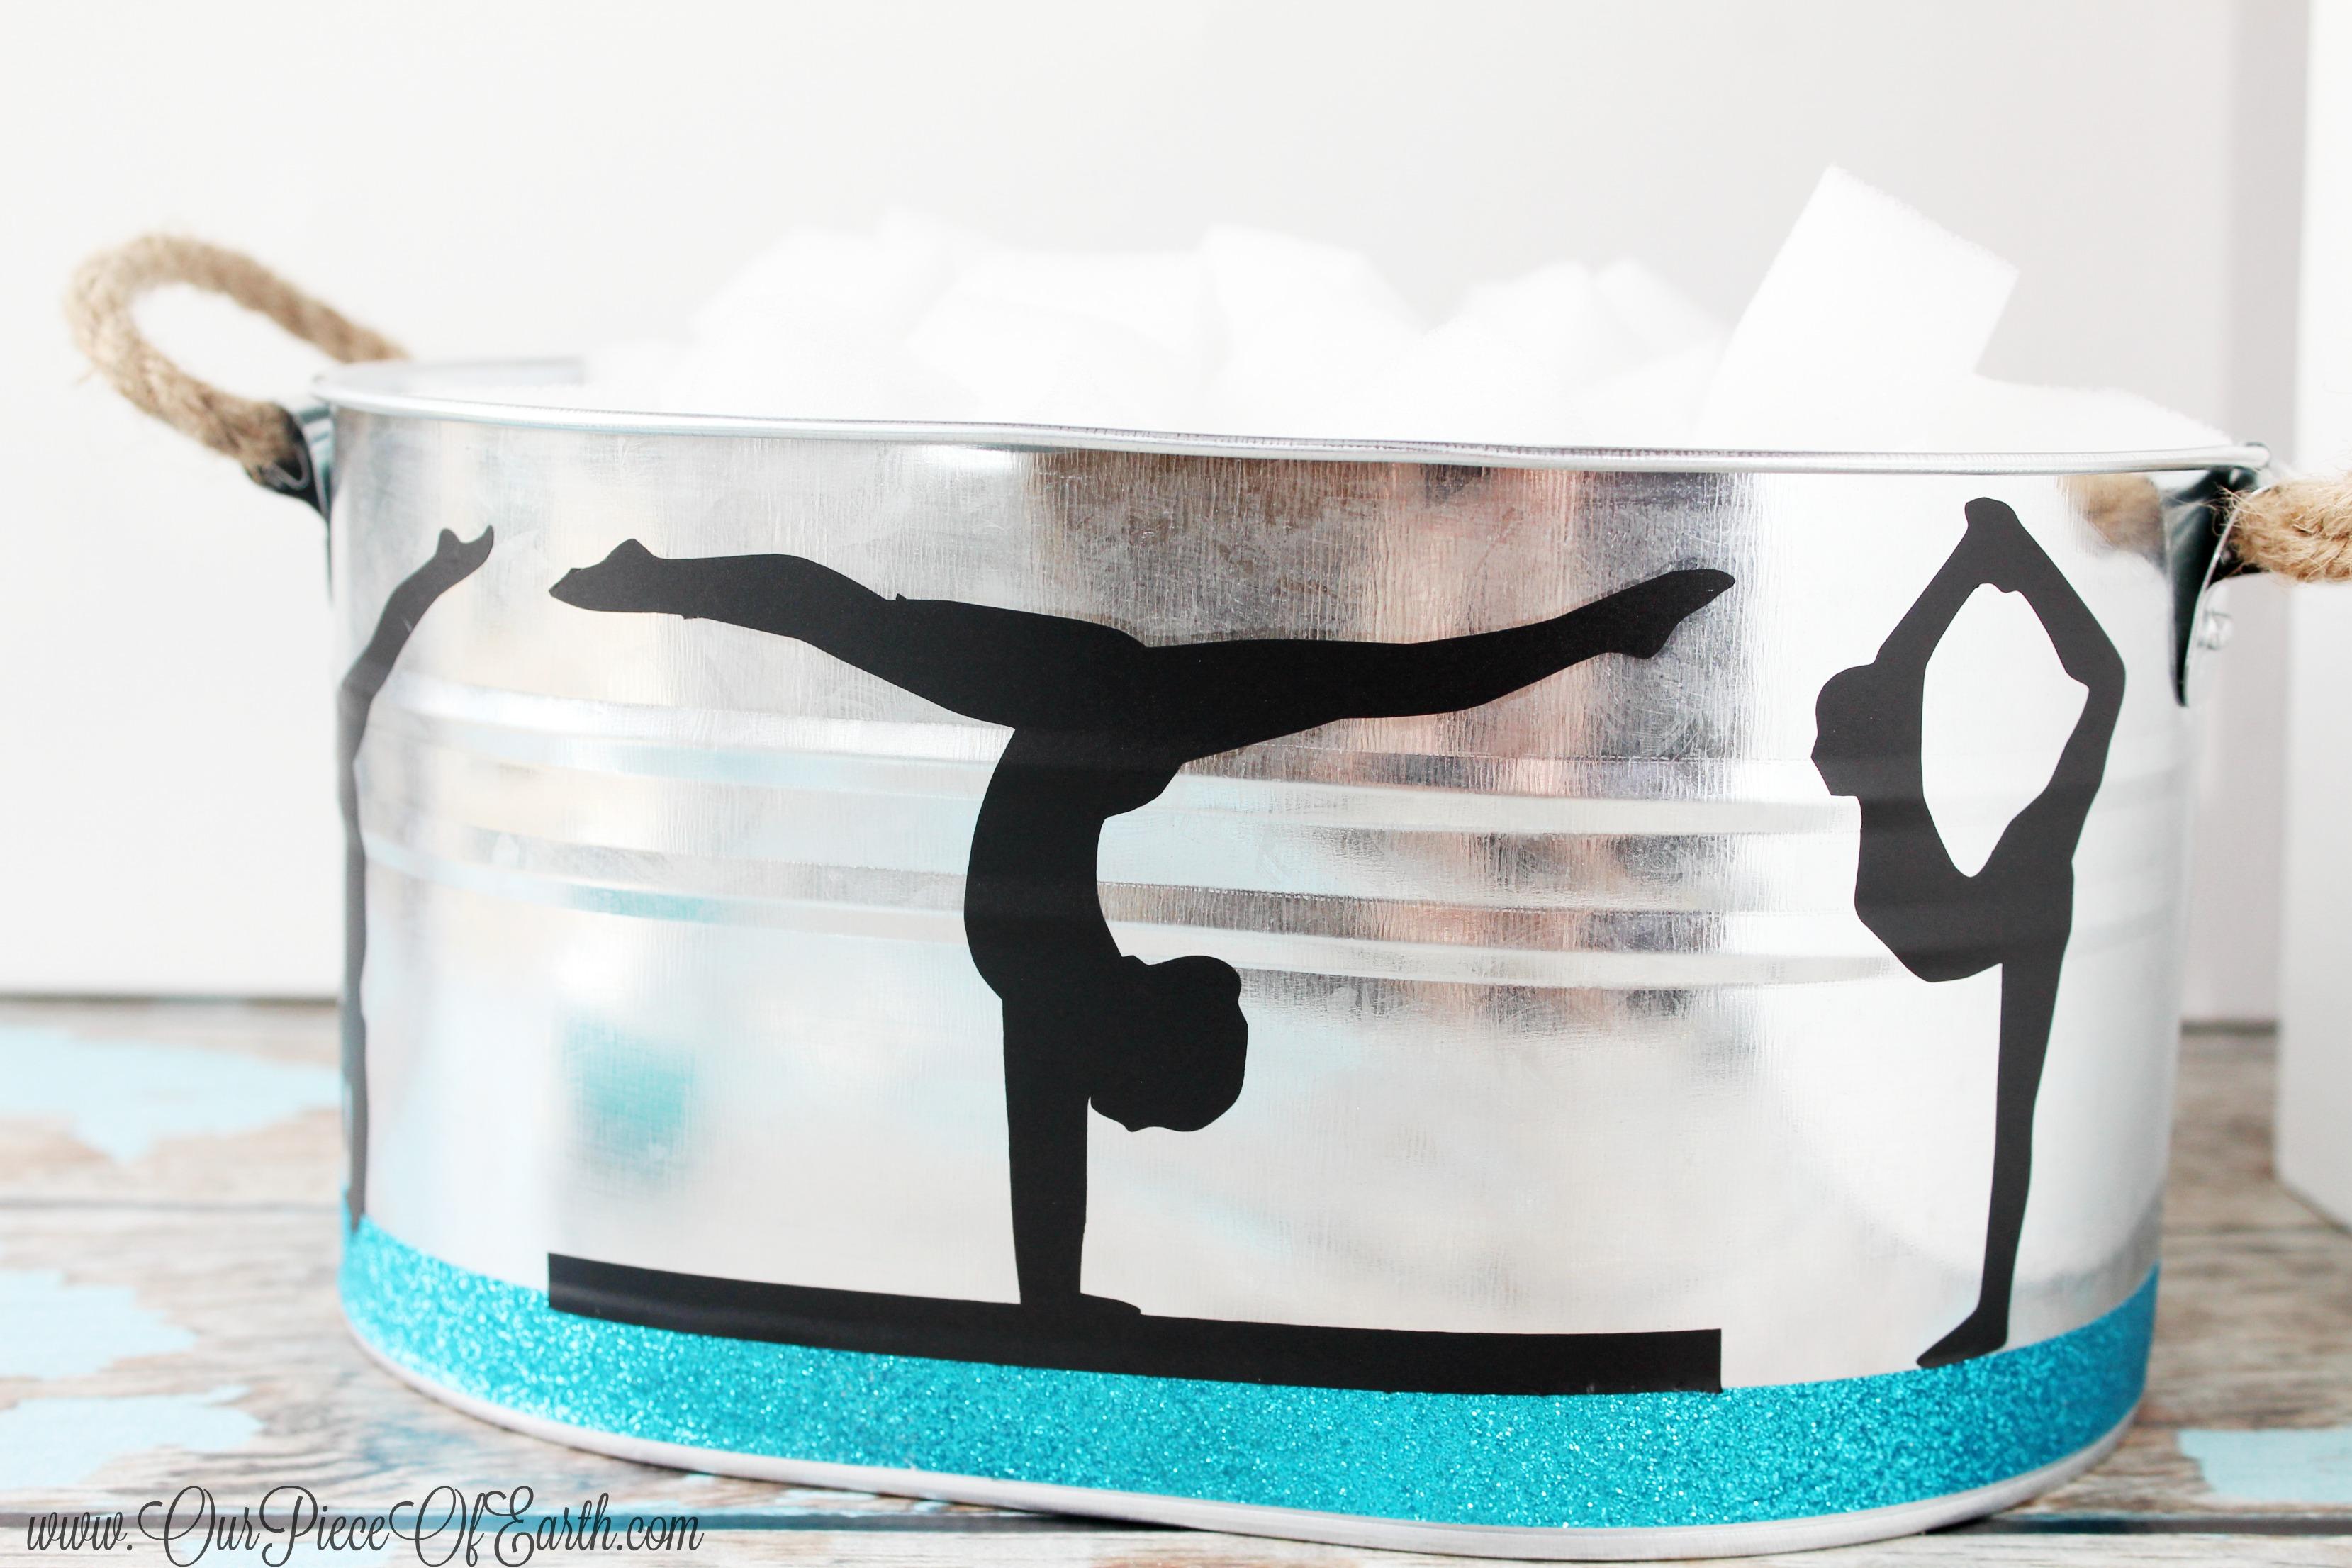 Gymnastics Silhouette #GIVEEXTRAGETEXTRA